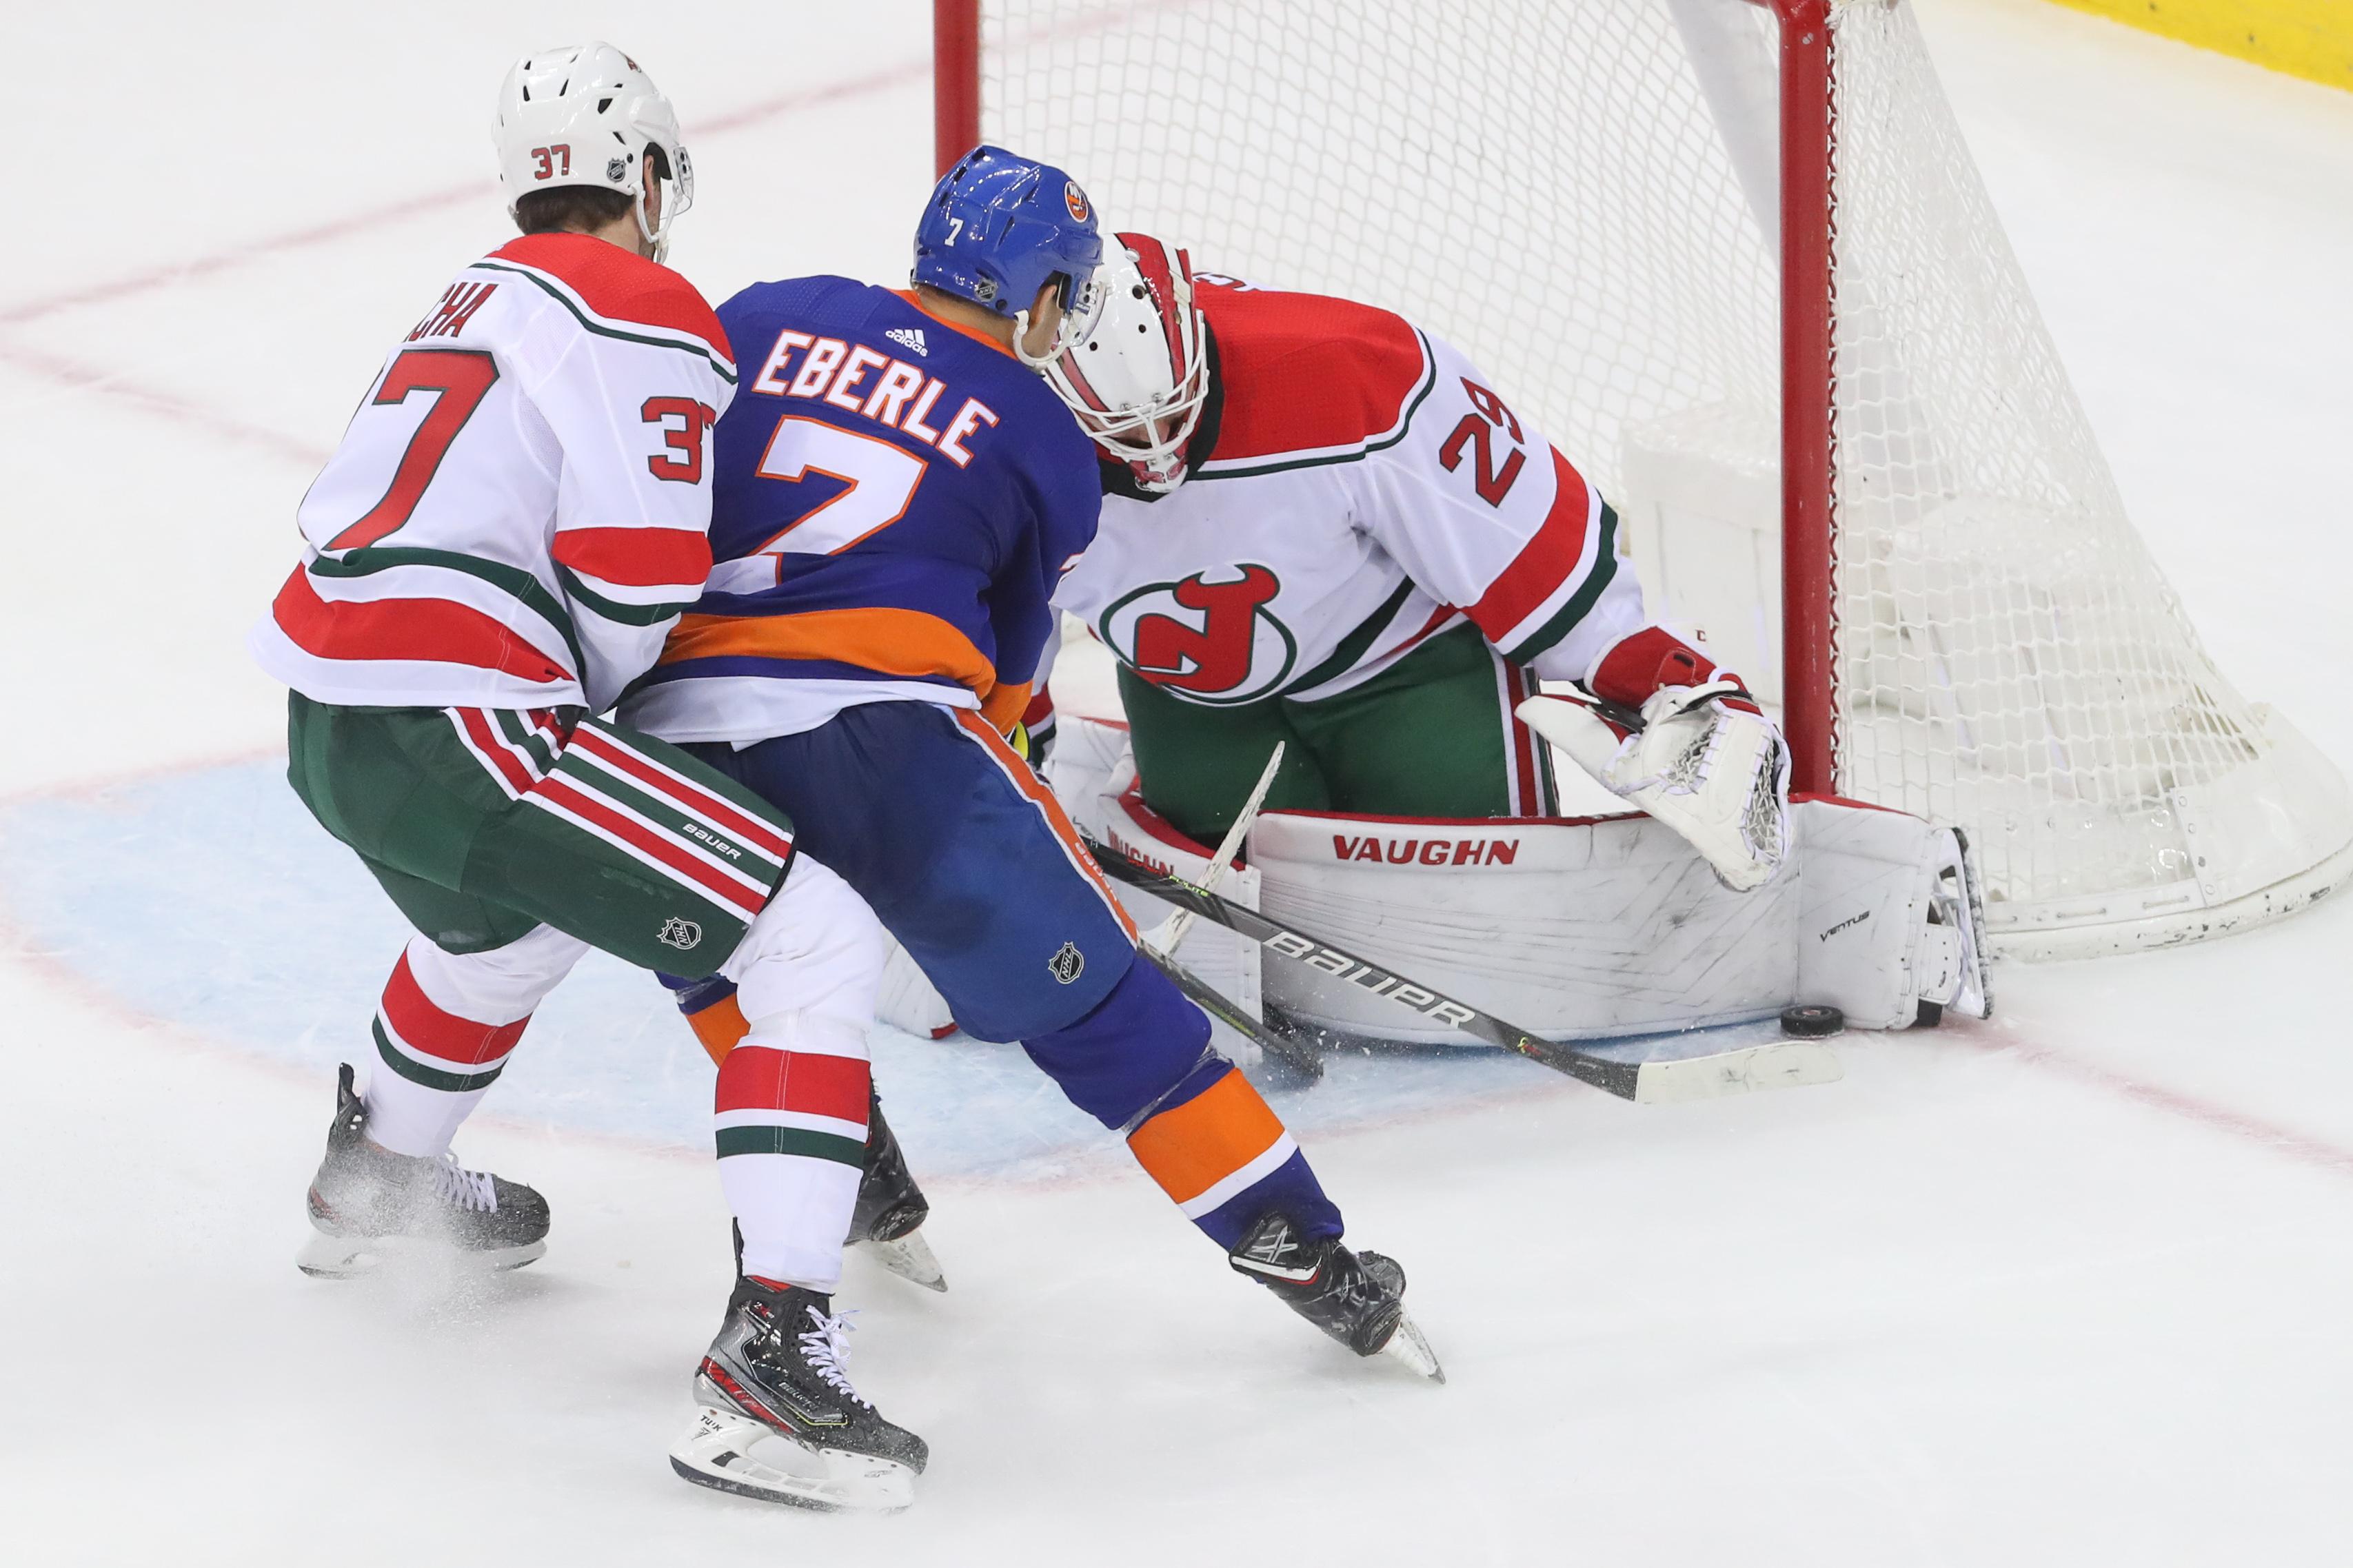 Islanders need Eberle to start scoring more consistently